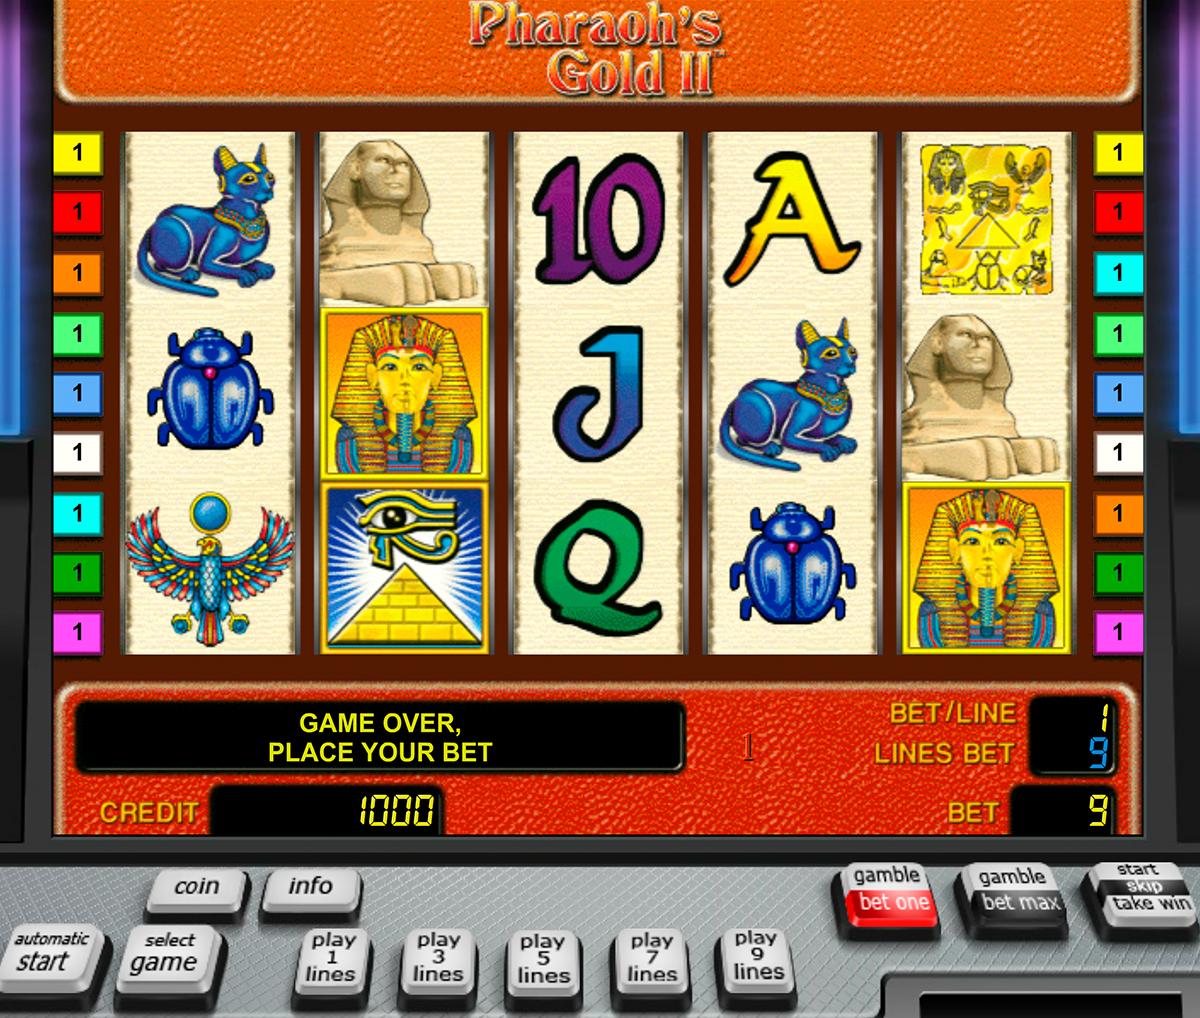 Spiele Inca Gold II - Video Slots Online